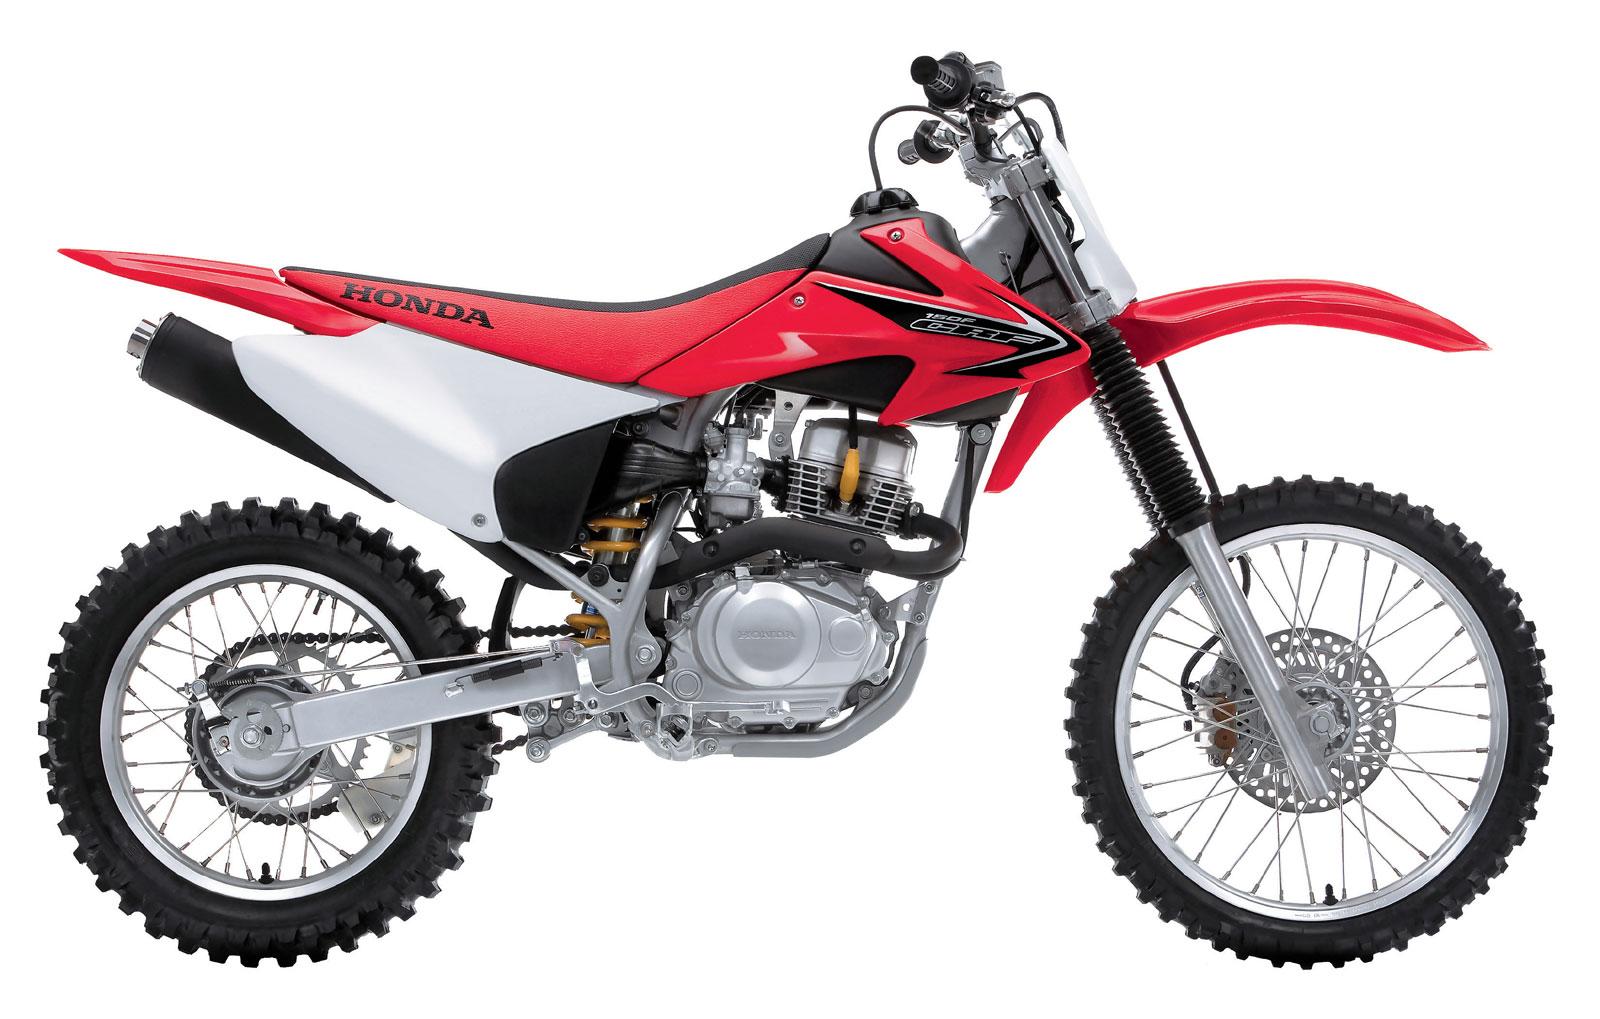 Mantap Jika AHM Bikin Motor Trail Dengan Basis Mesin Honda Verza